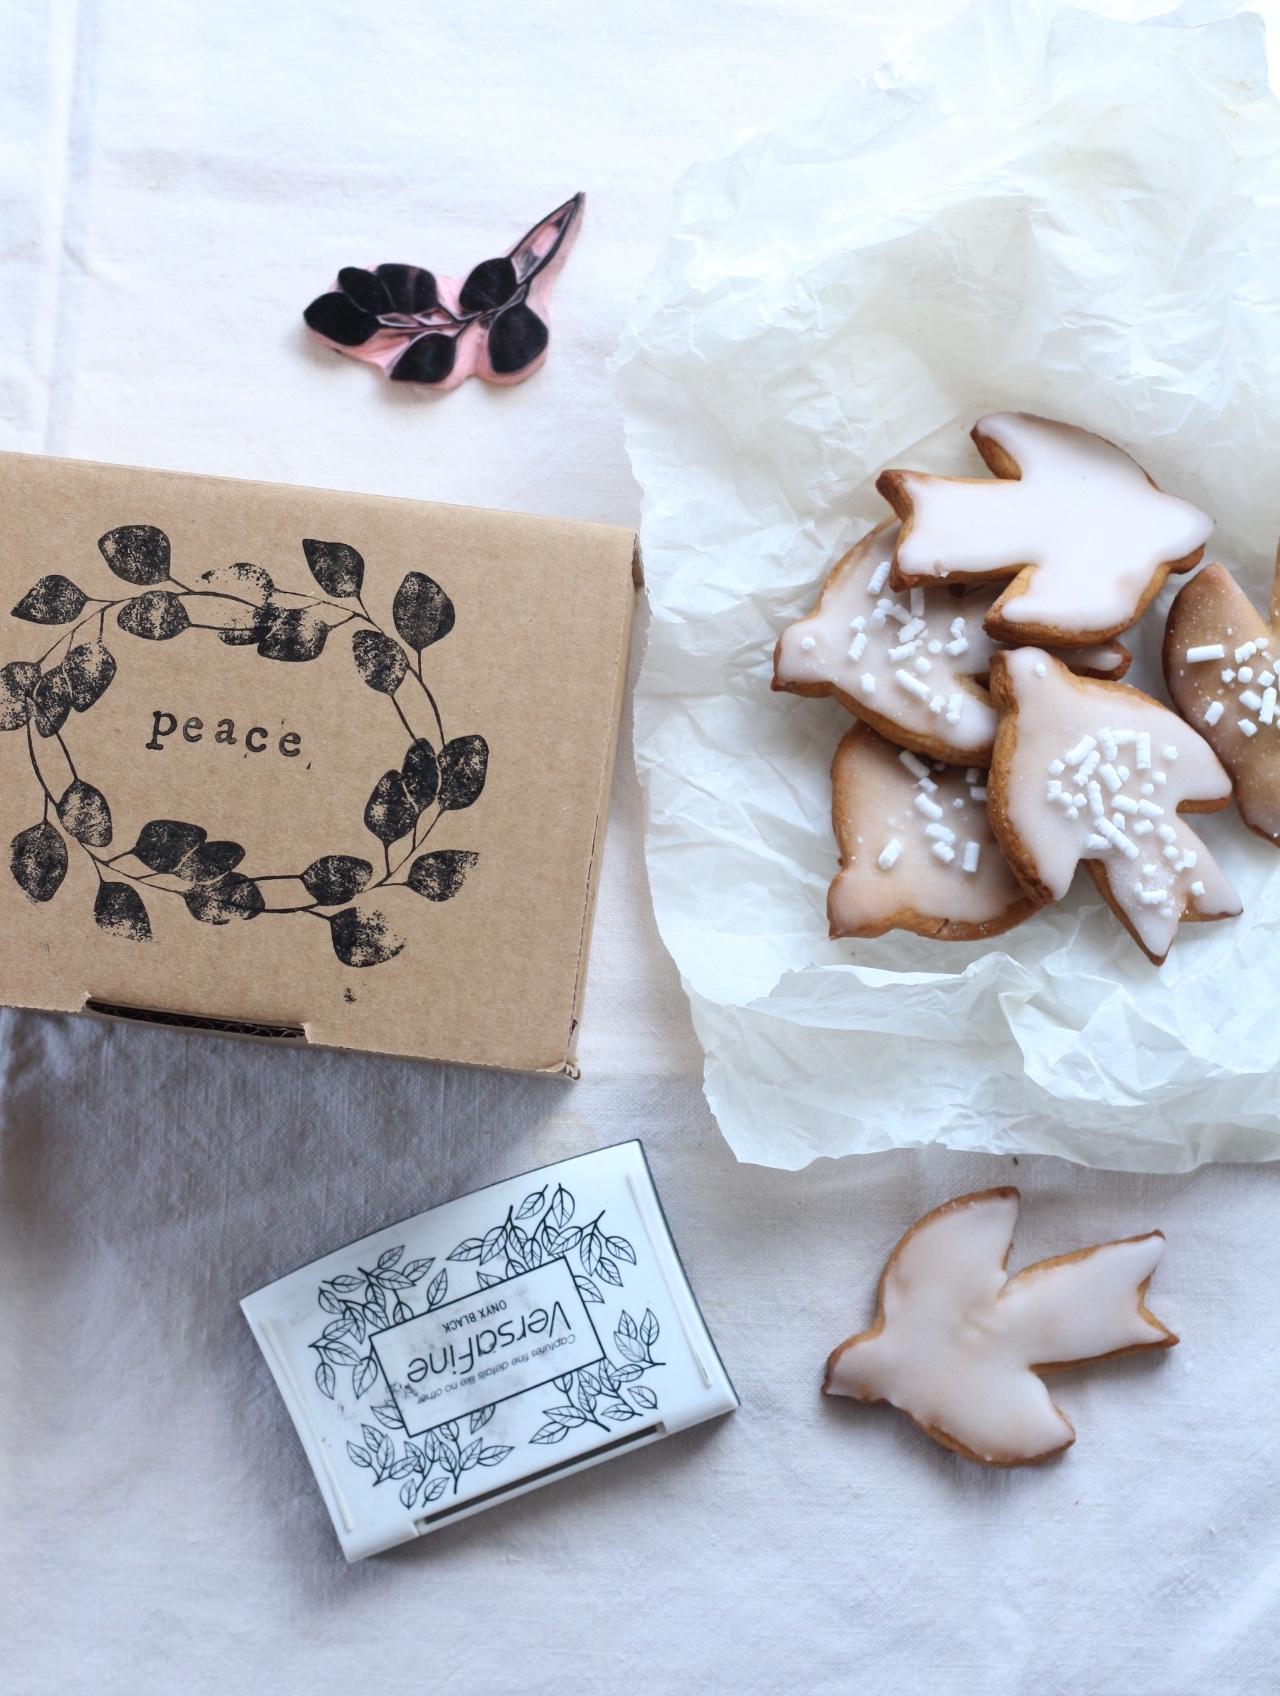 regalare biscotti